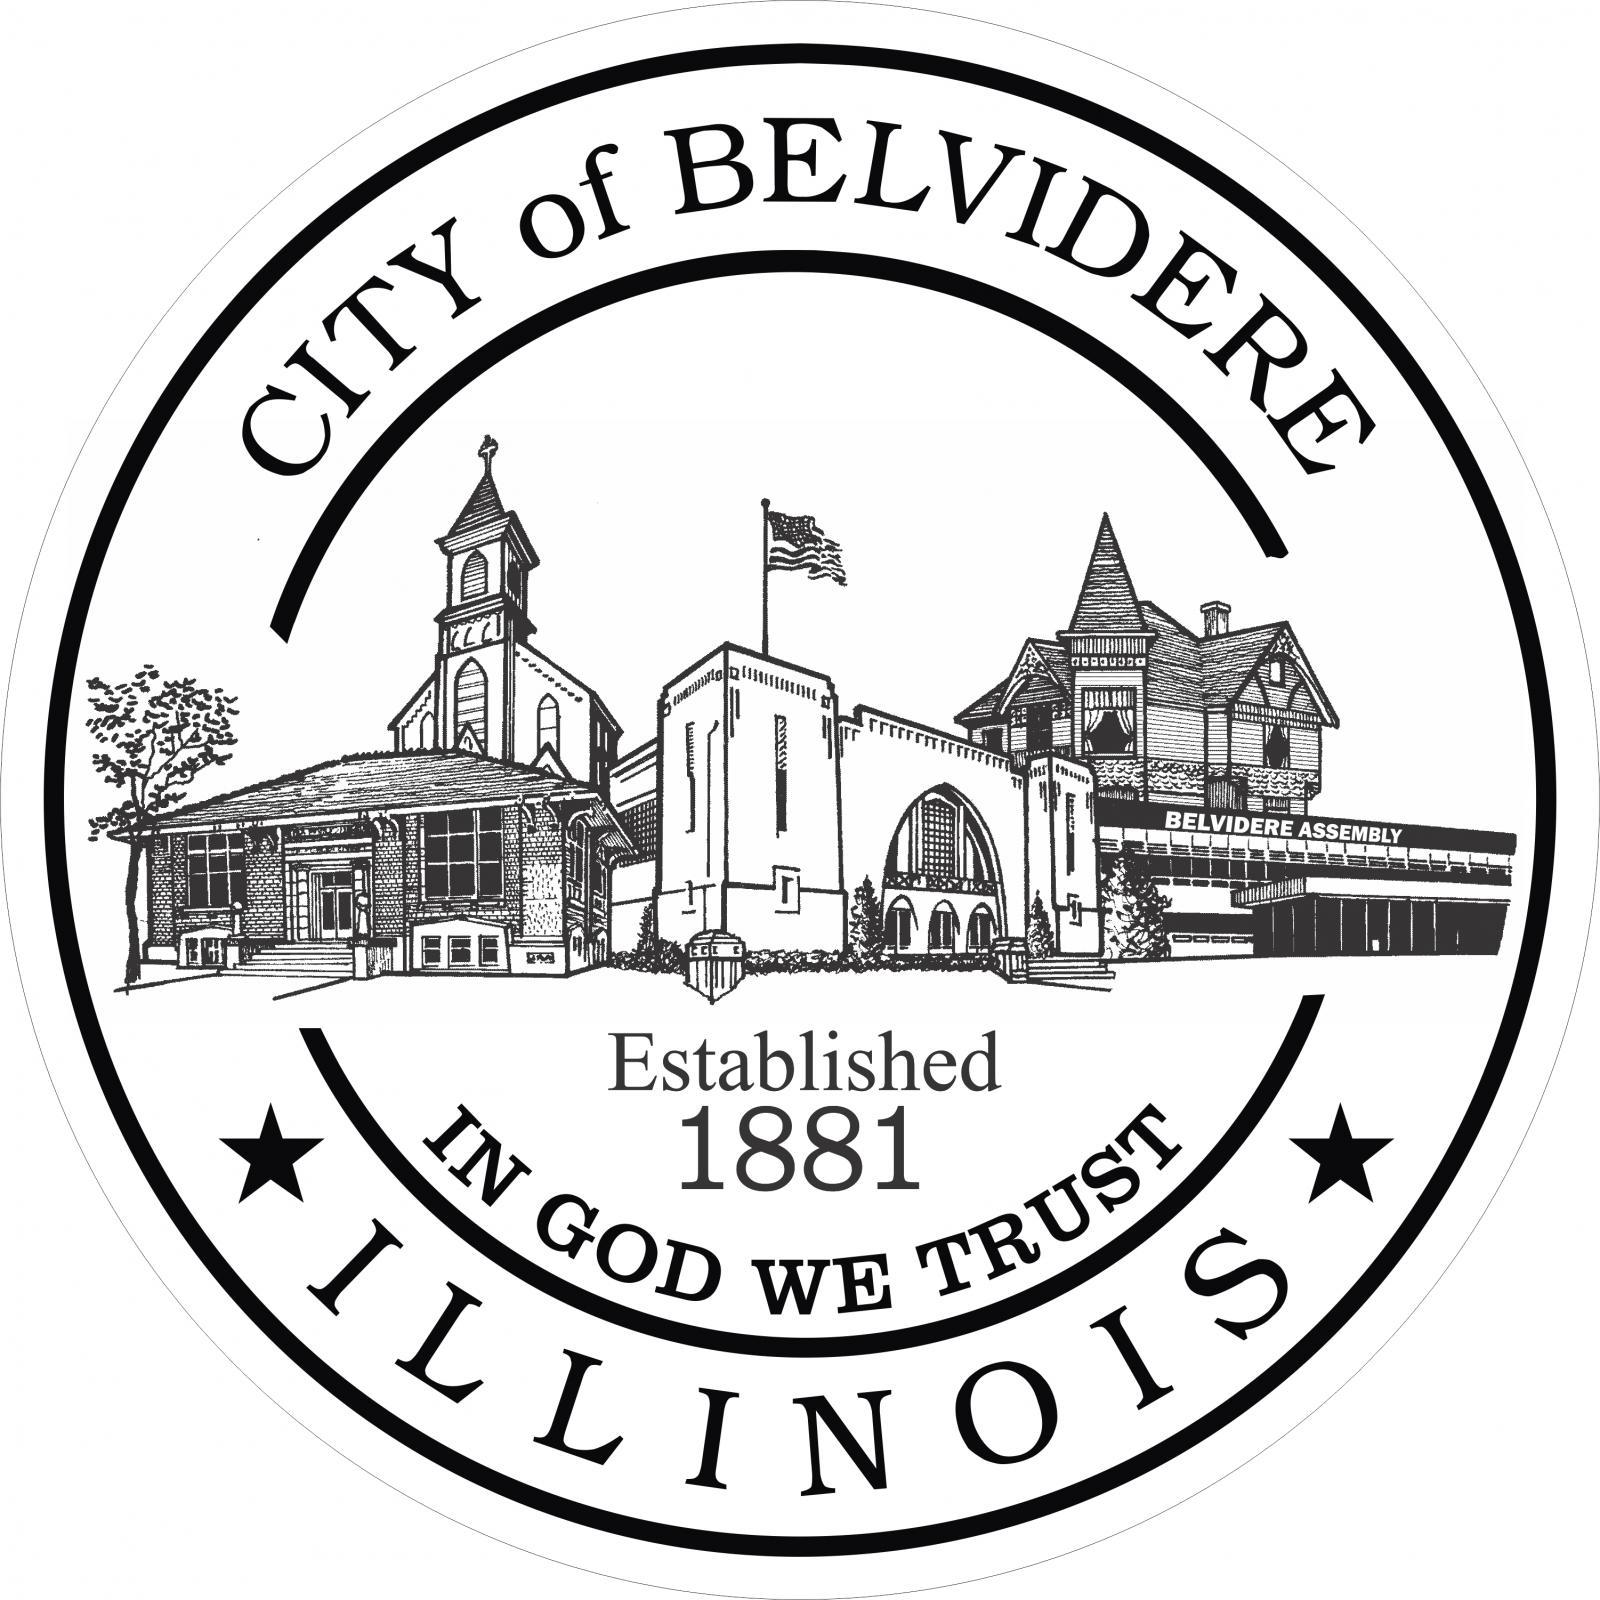 City of Belvidere Slide Image